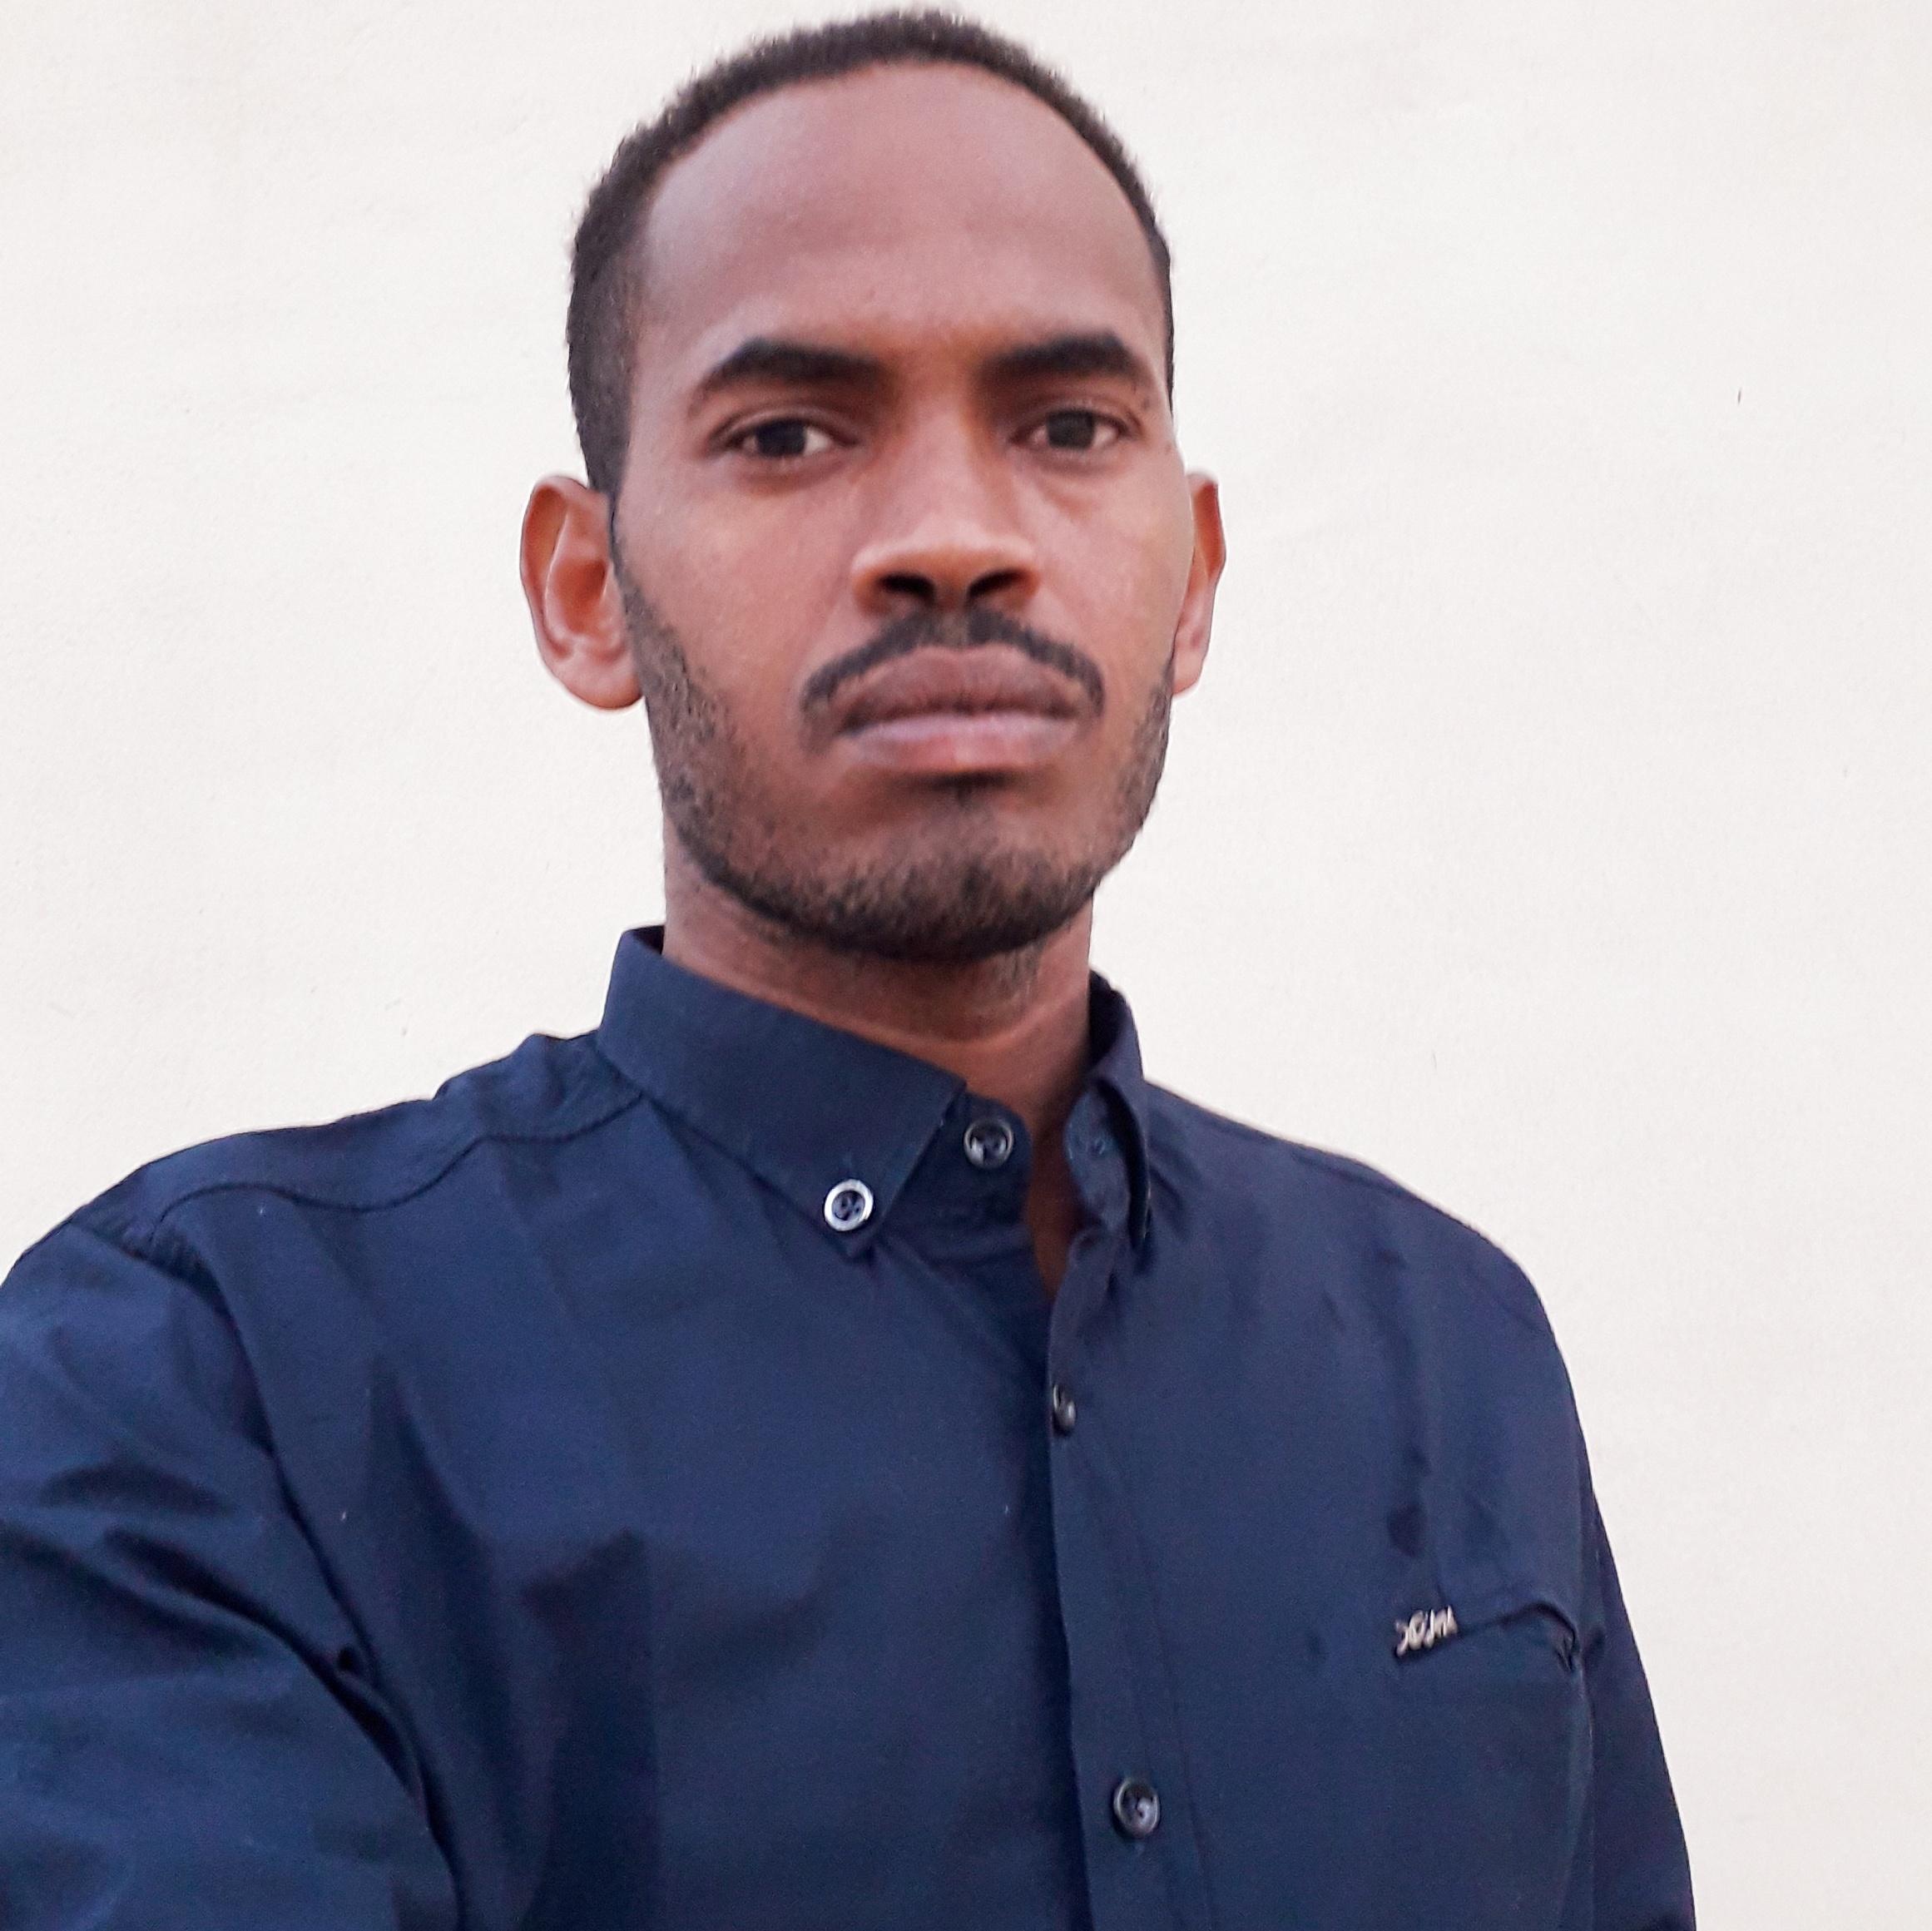 Khaderyosuf Profile Picture